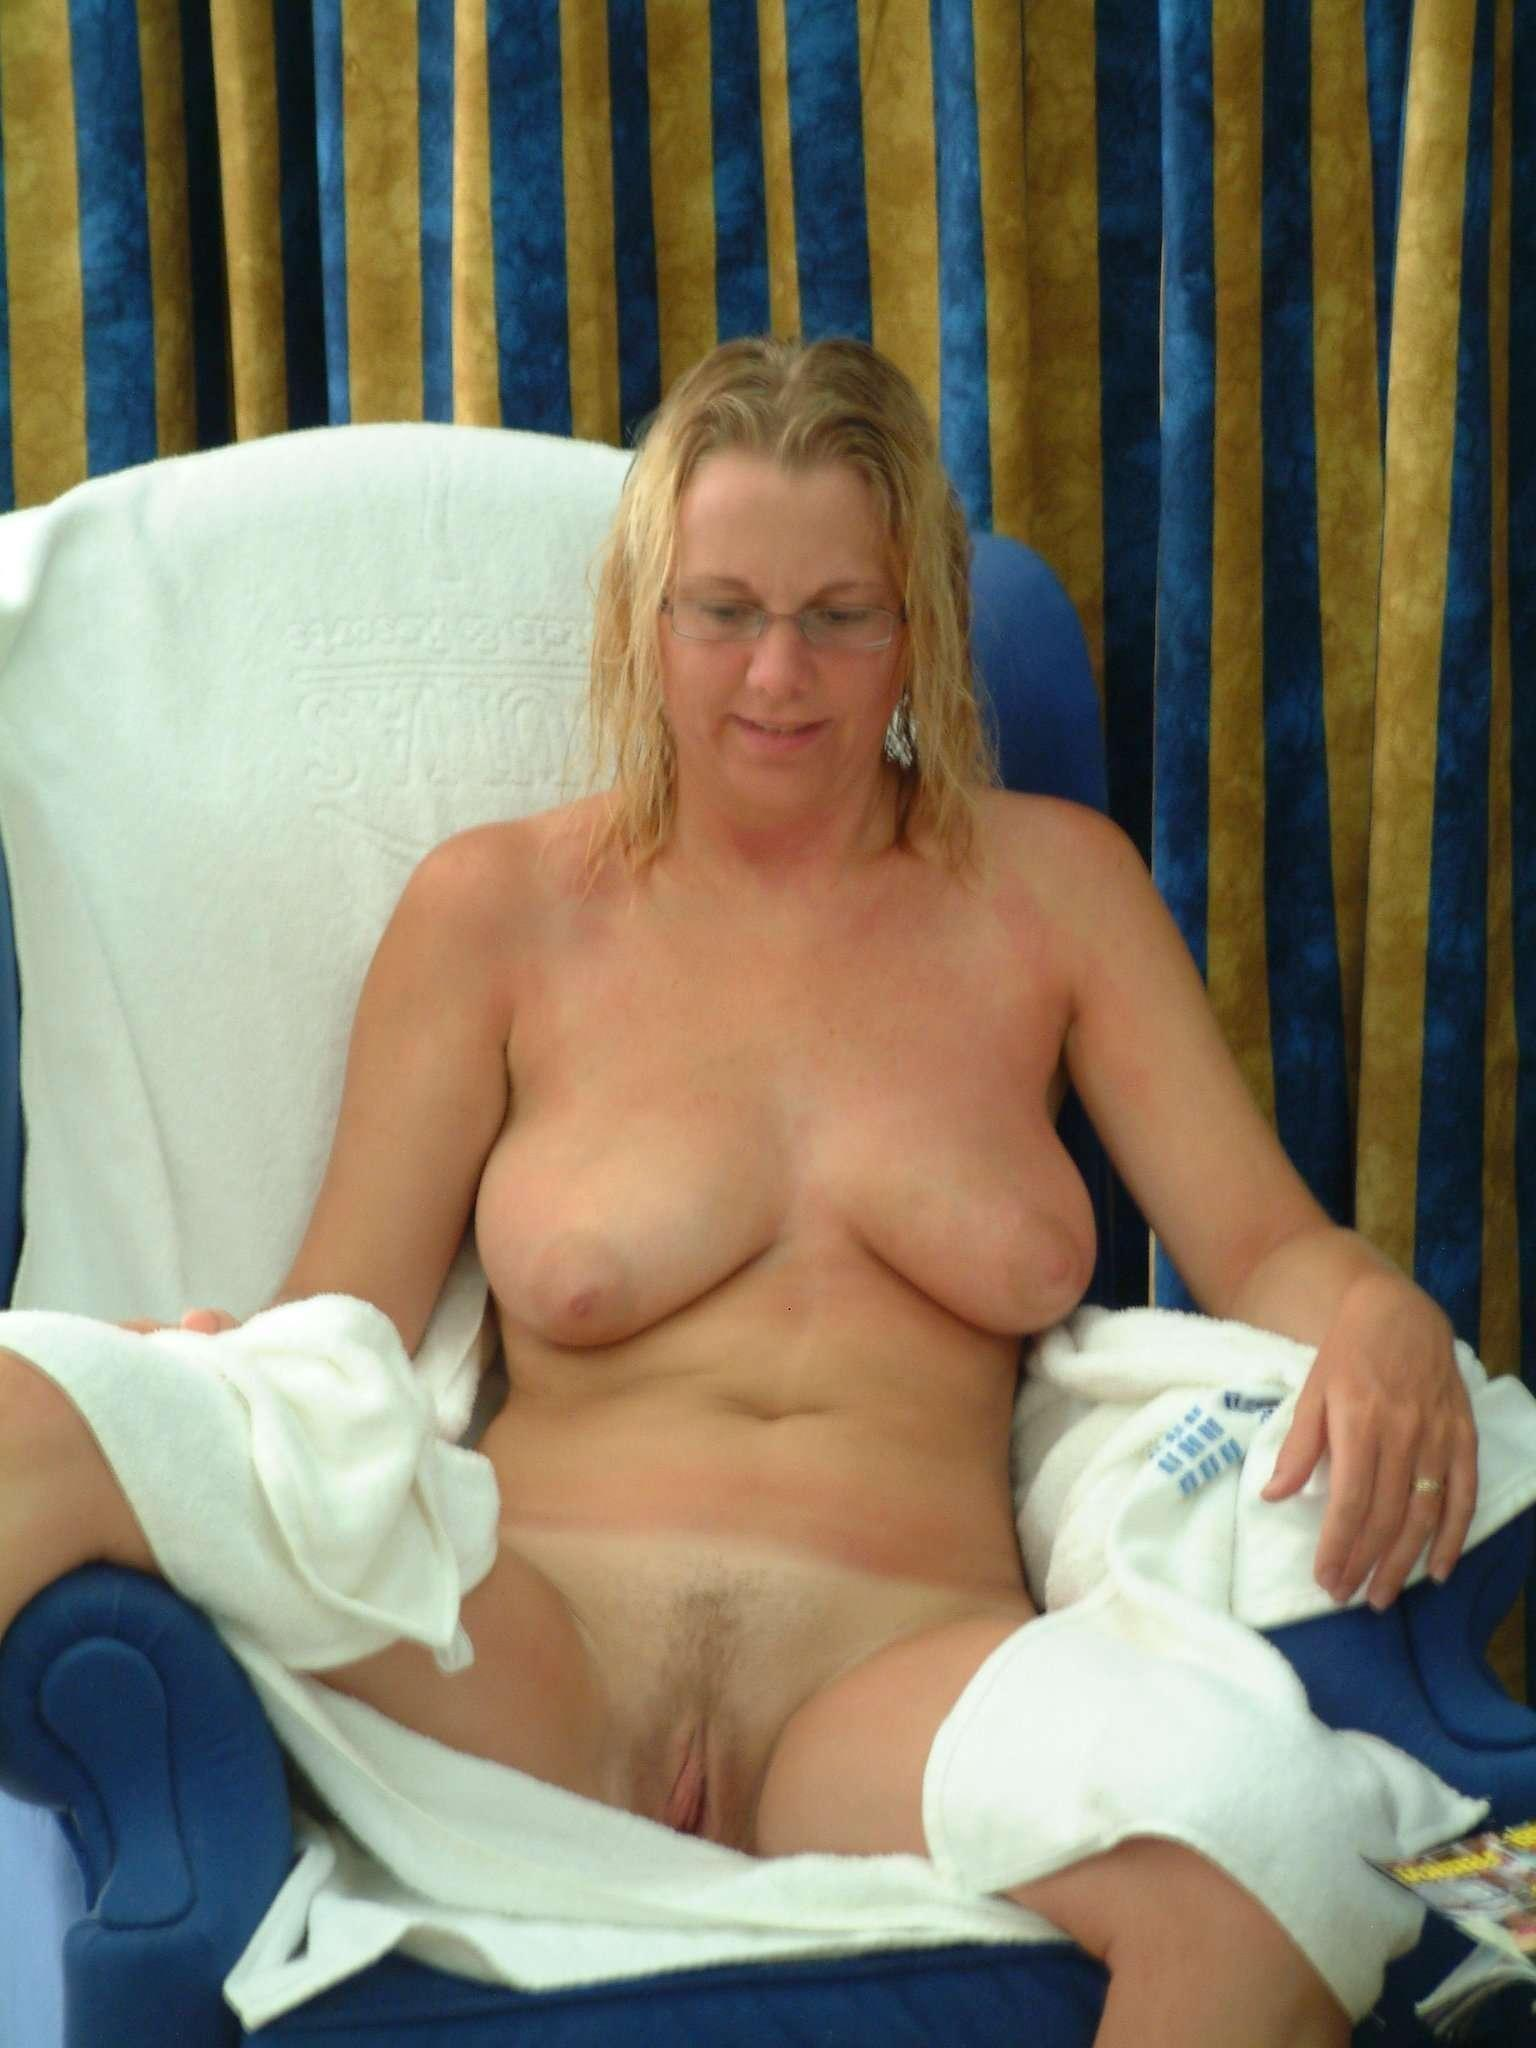 Butt plugs sex toys